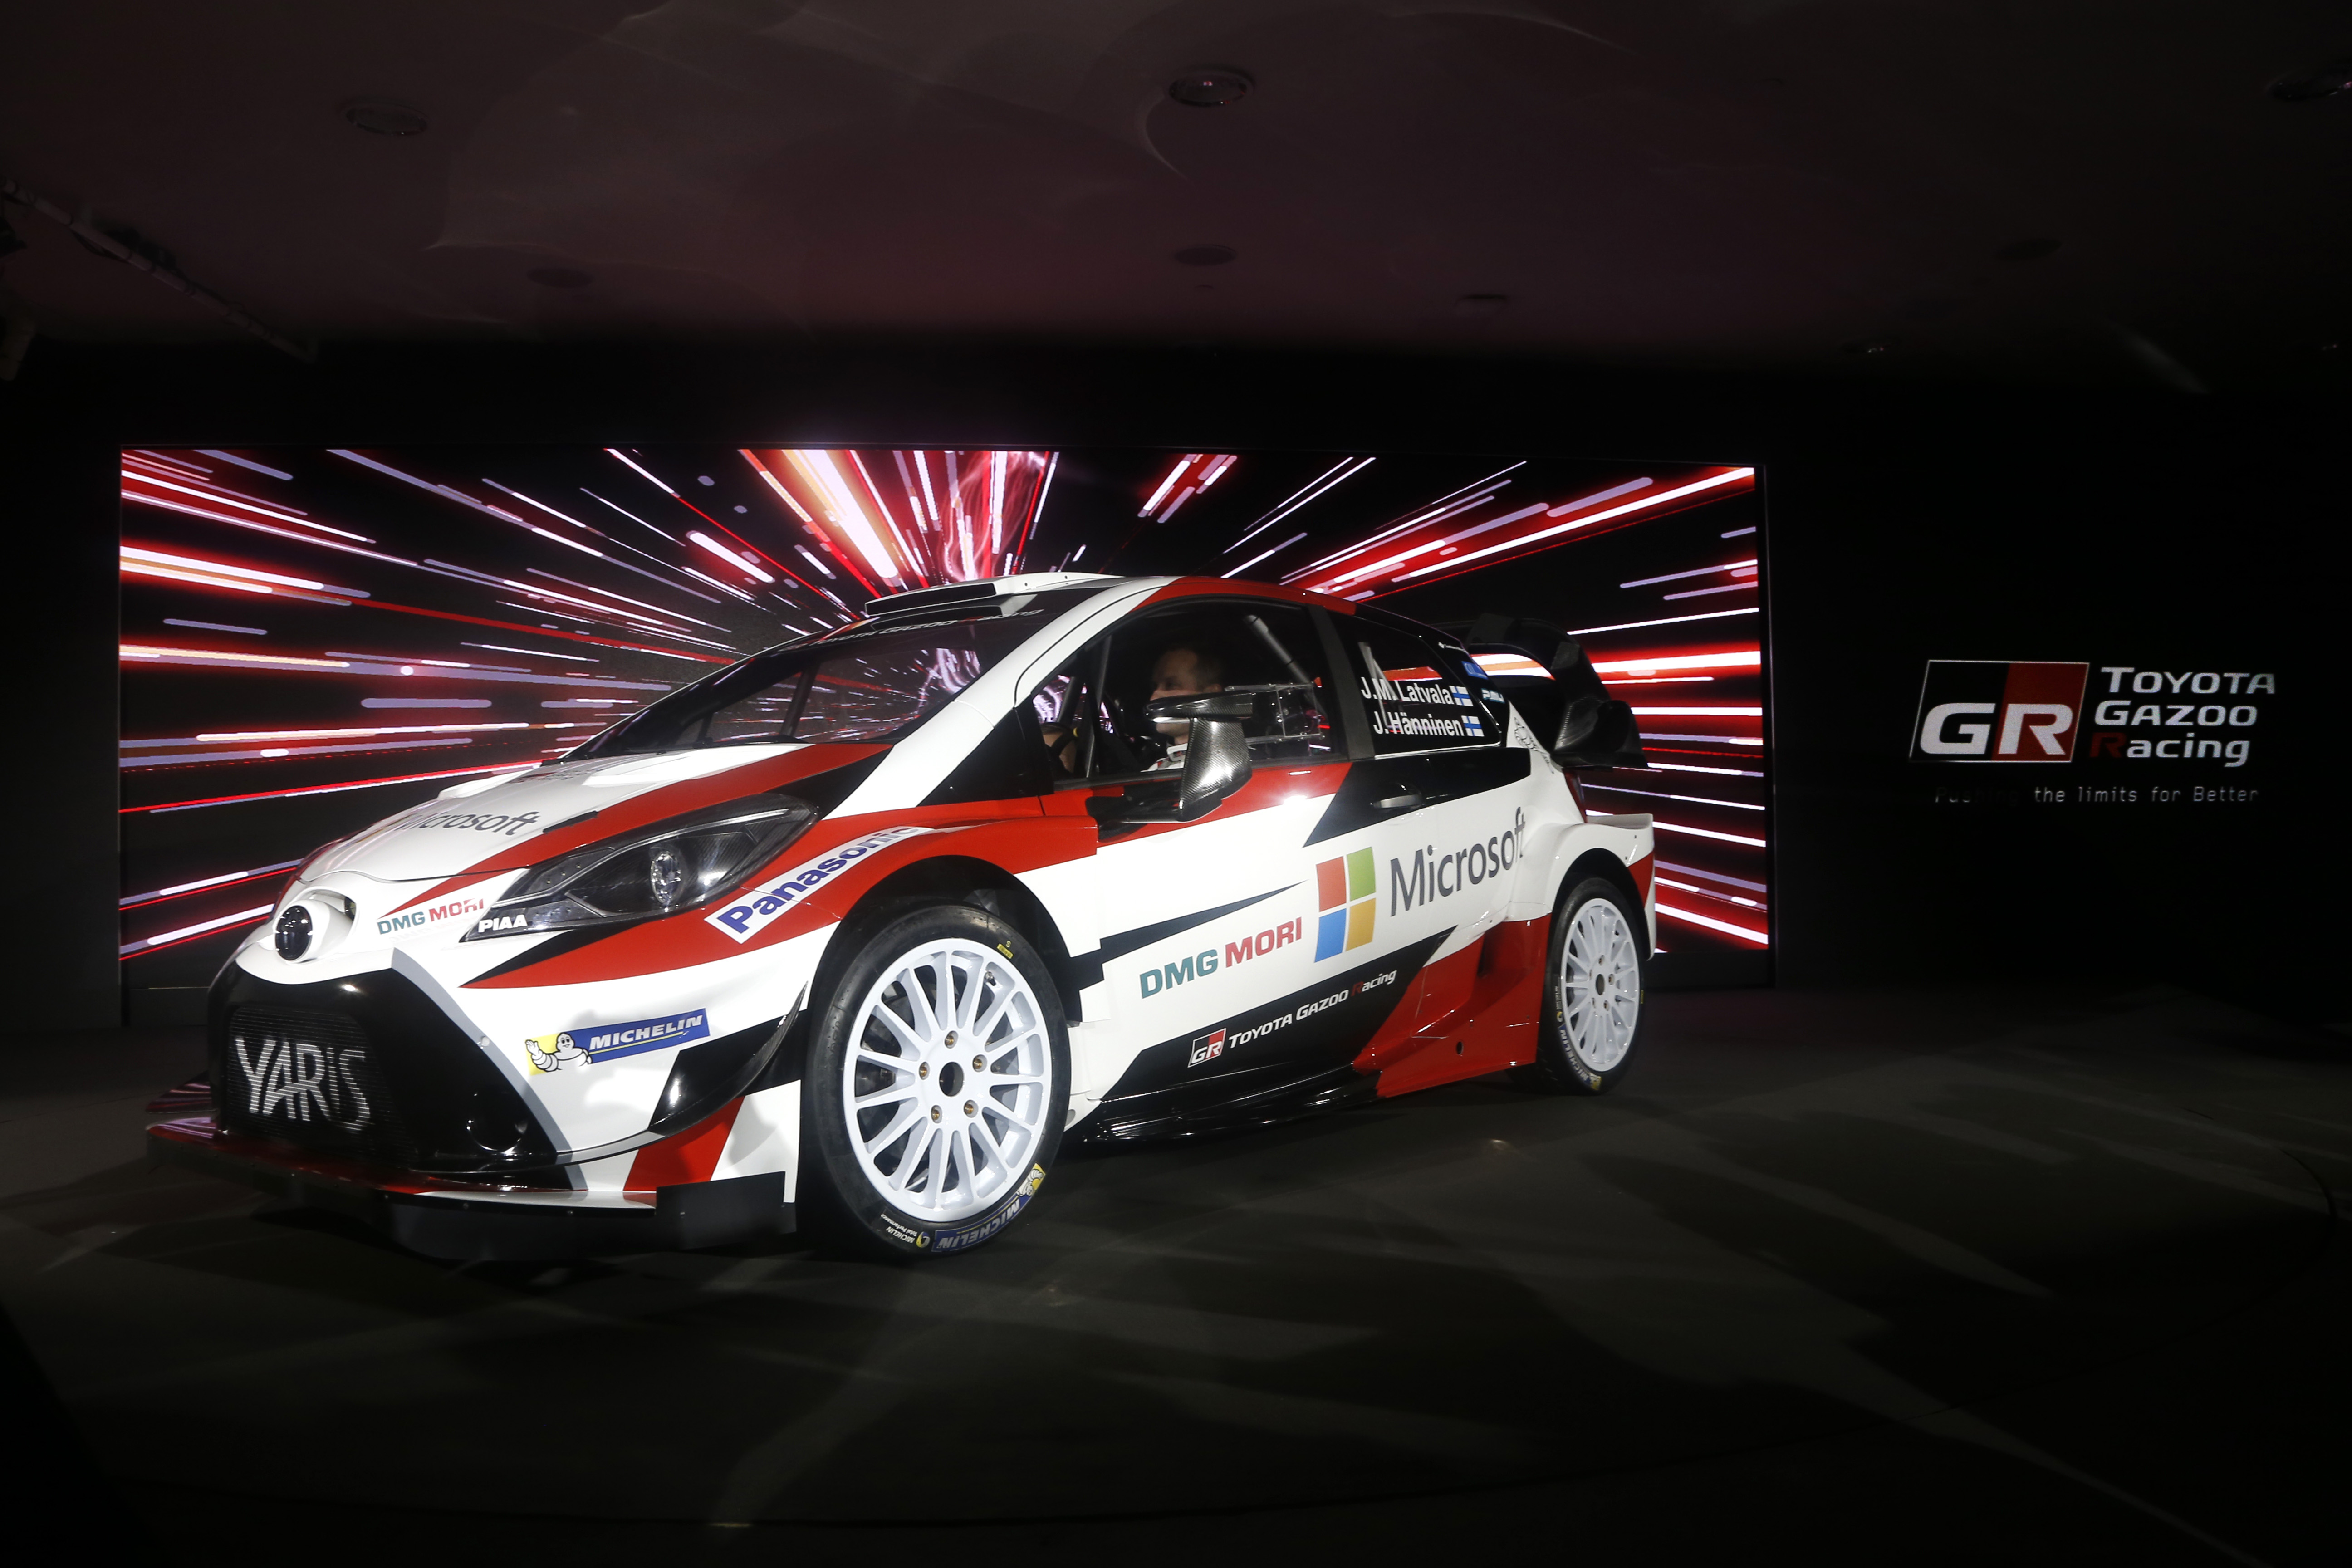 ToyotaGazooRacingWRC Official Presentation 13December 2017 – Helsinki